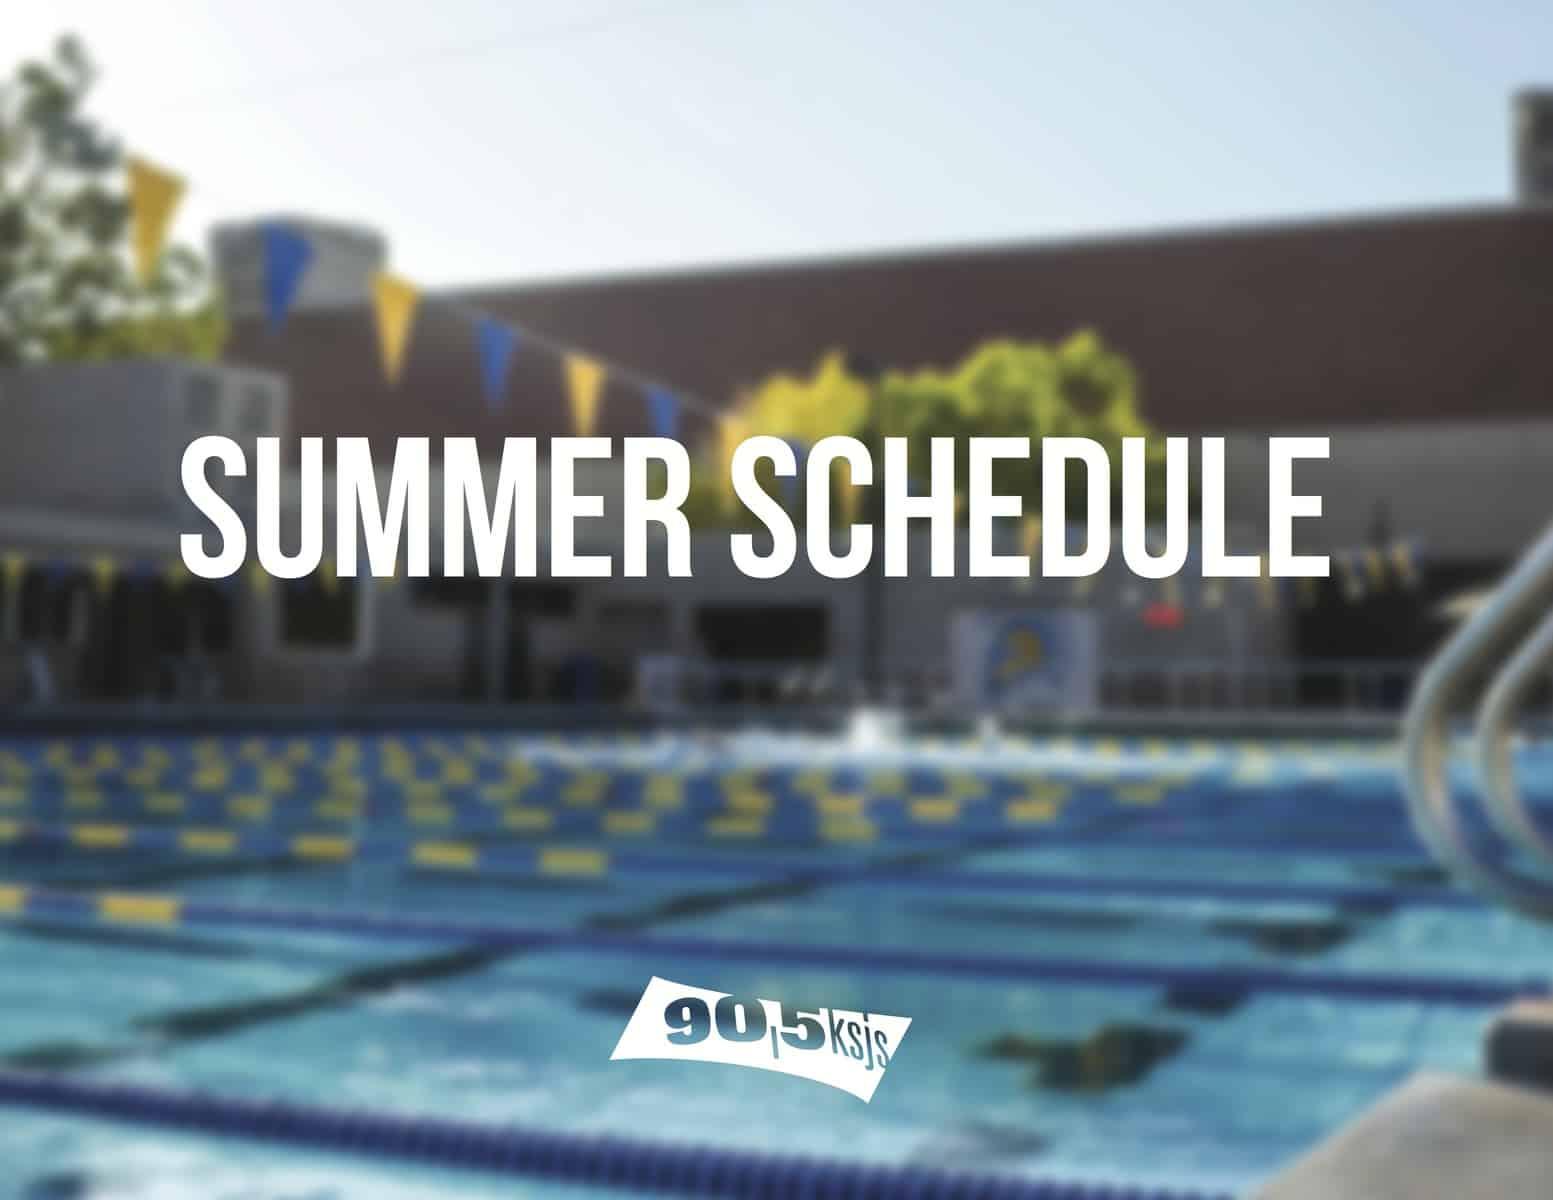 SUMMER 2014 AD